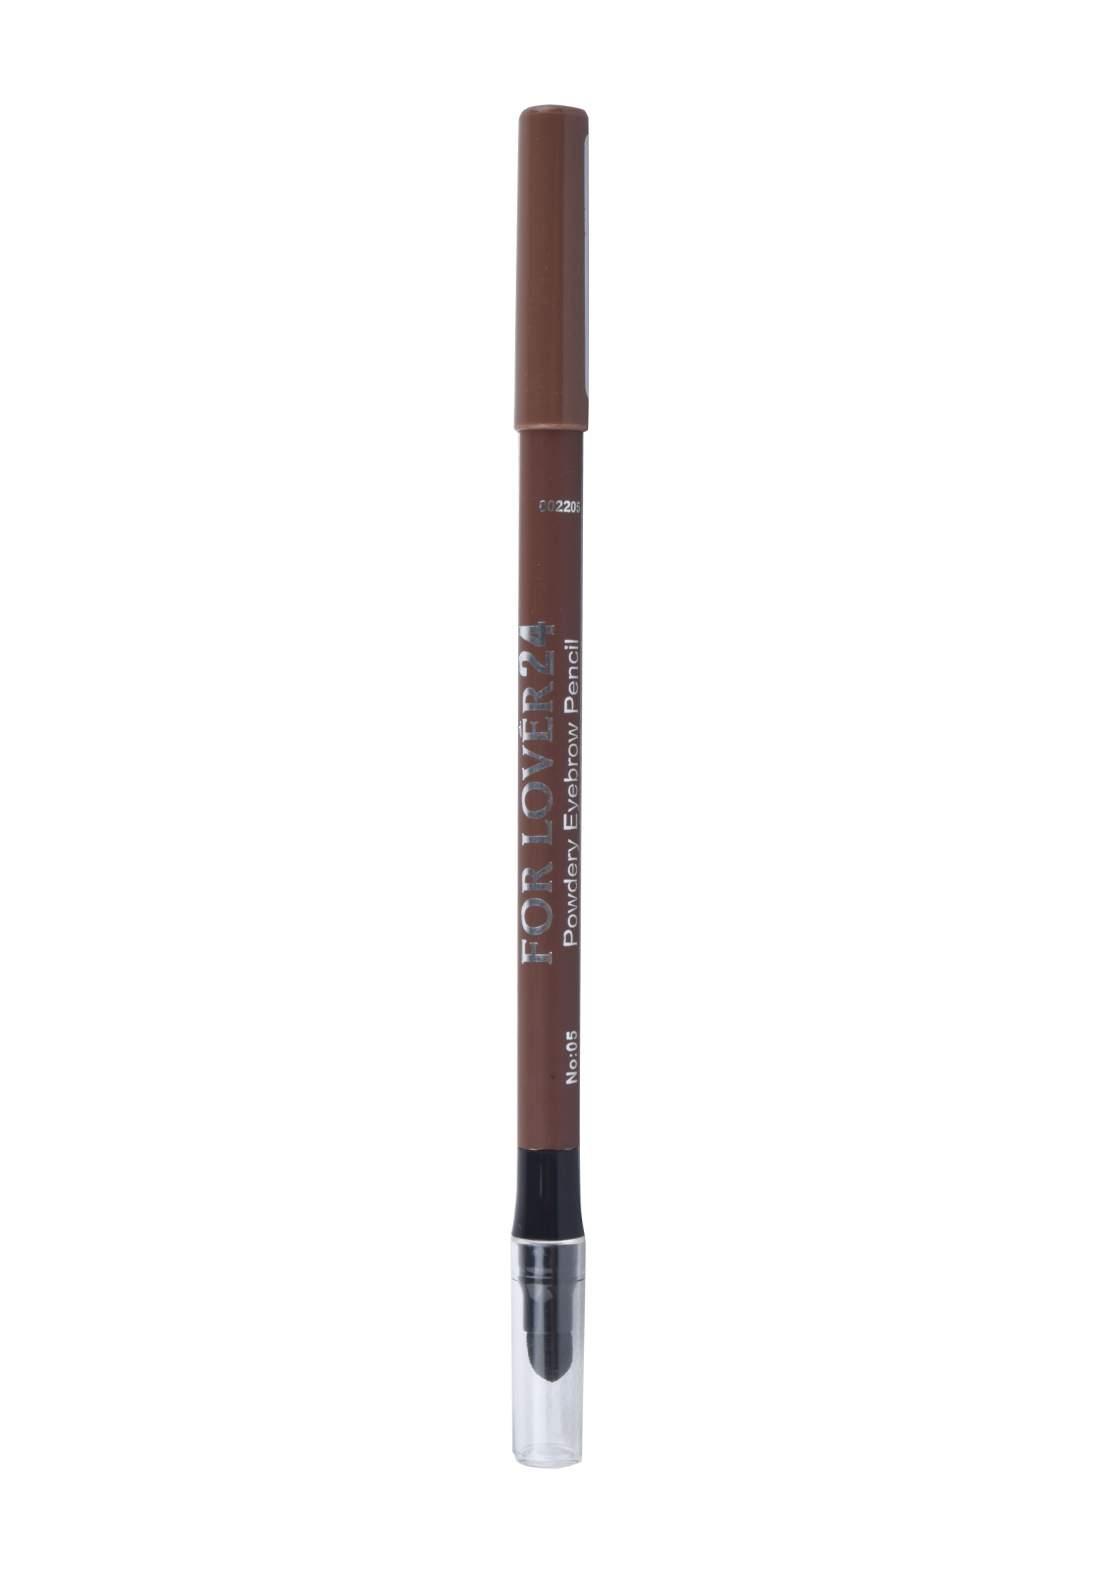 For Lover 24 Powder Eyebrow Pencil No.05 قلم حاجب